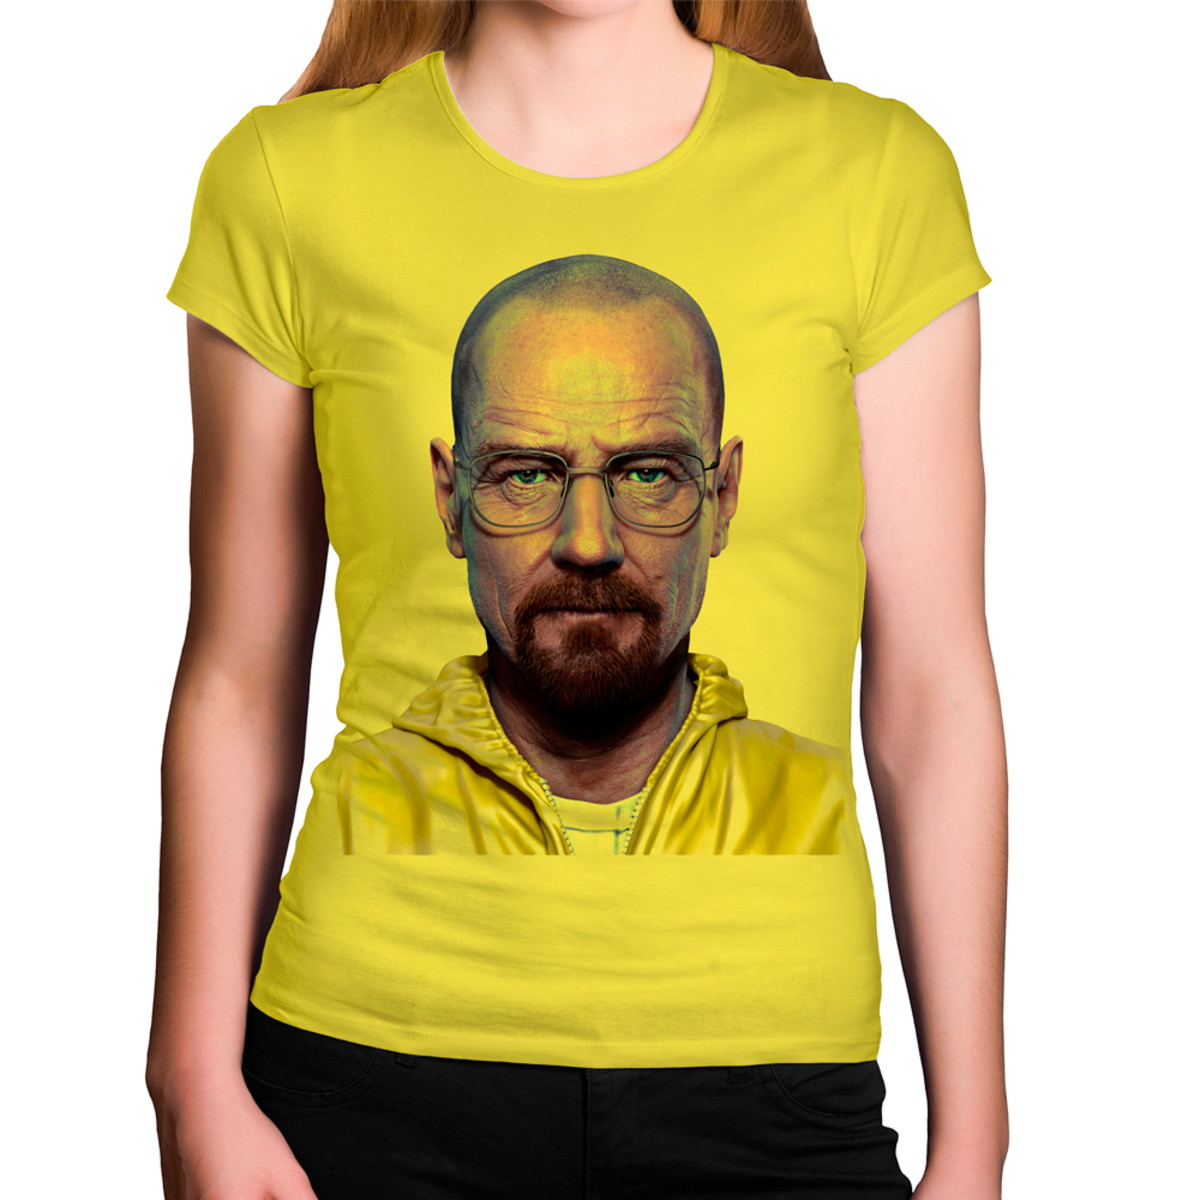 bac128728 Camiseta Feminina Amarela Breaking Bad Heisenberg Roupa Amar no Elo7 ...